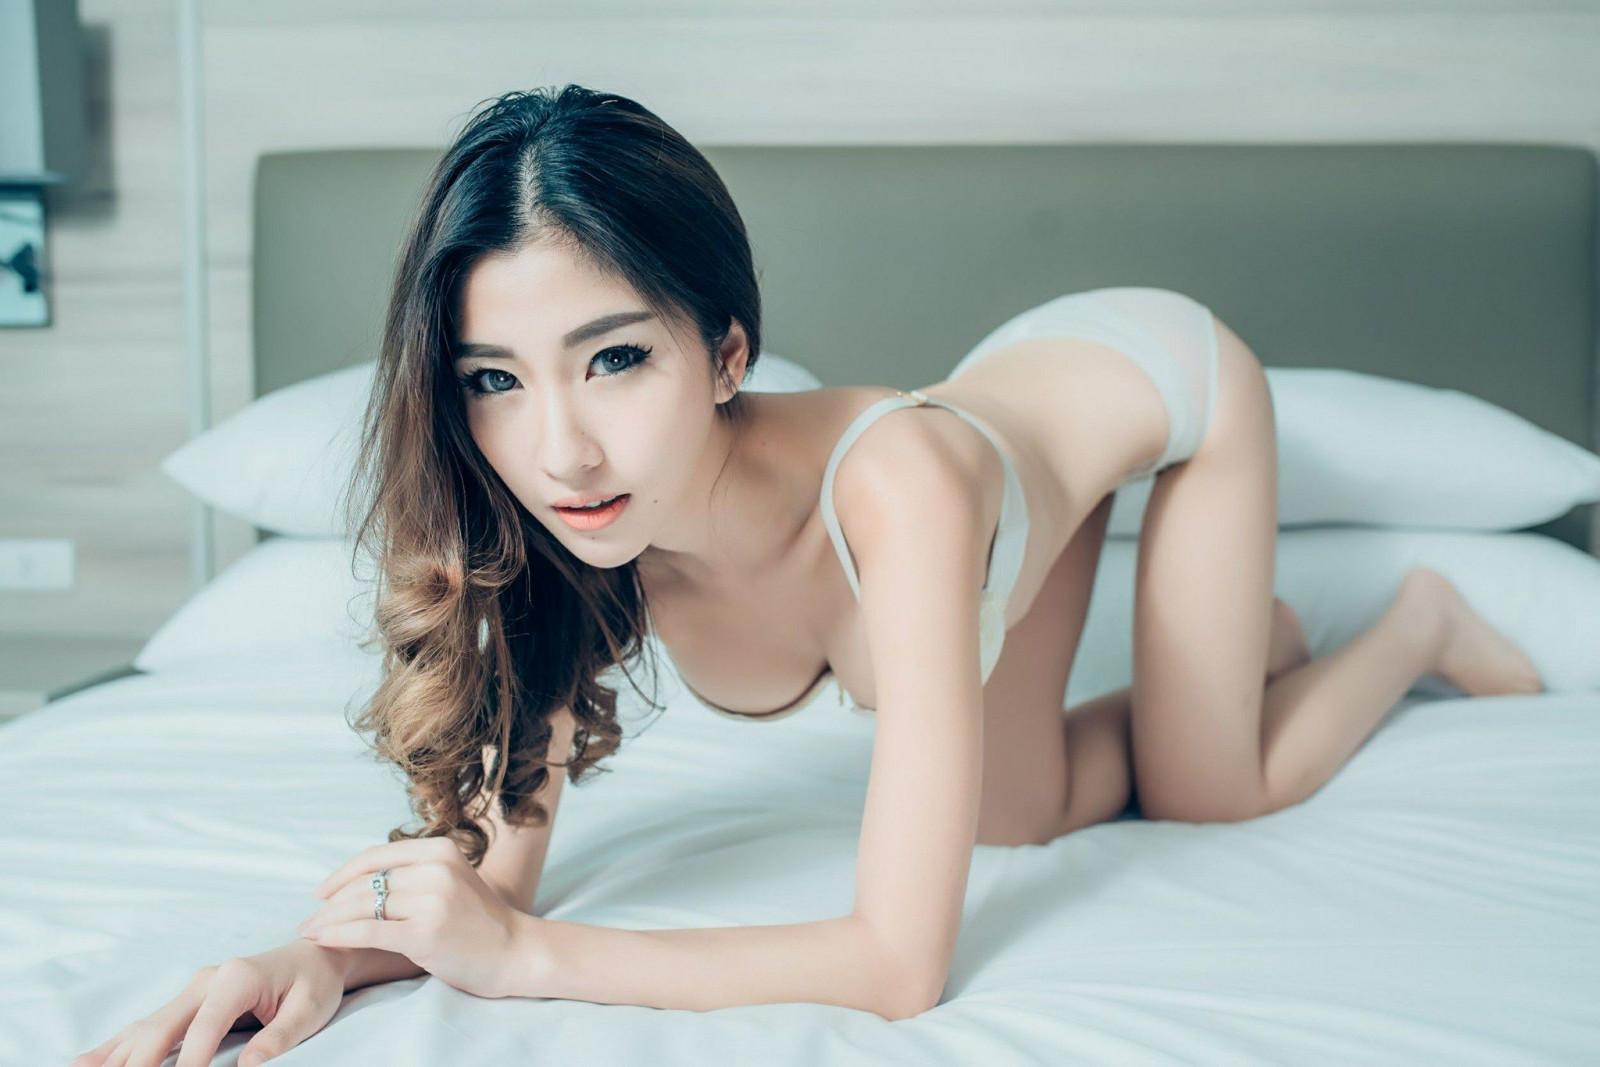 Stories asian model photo galleries panties